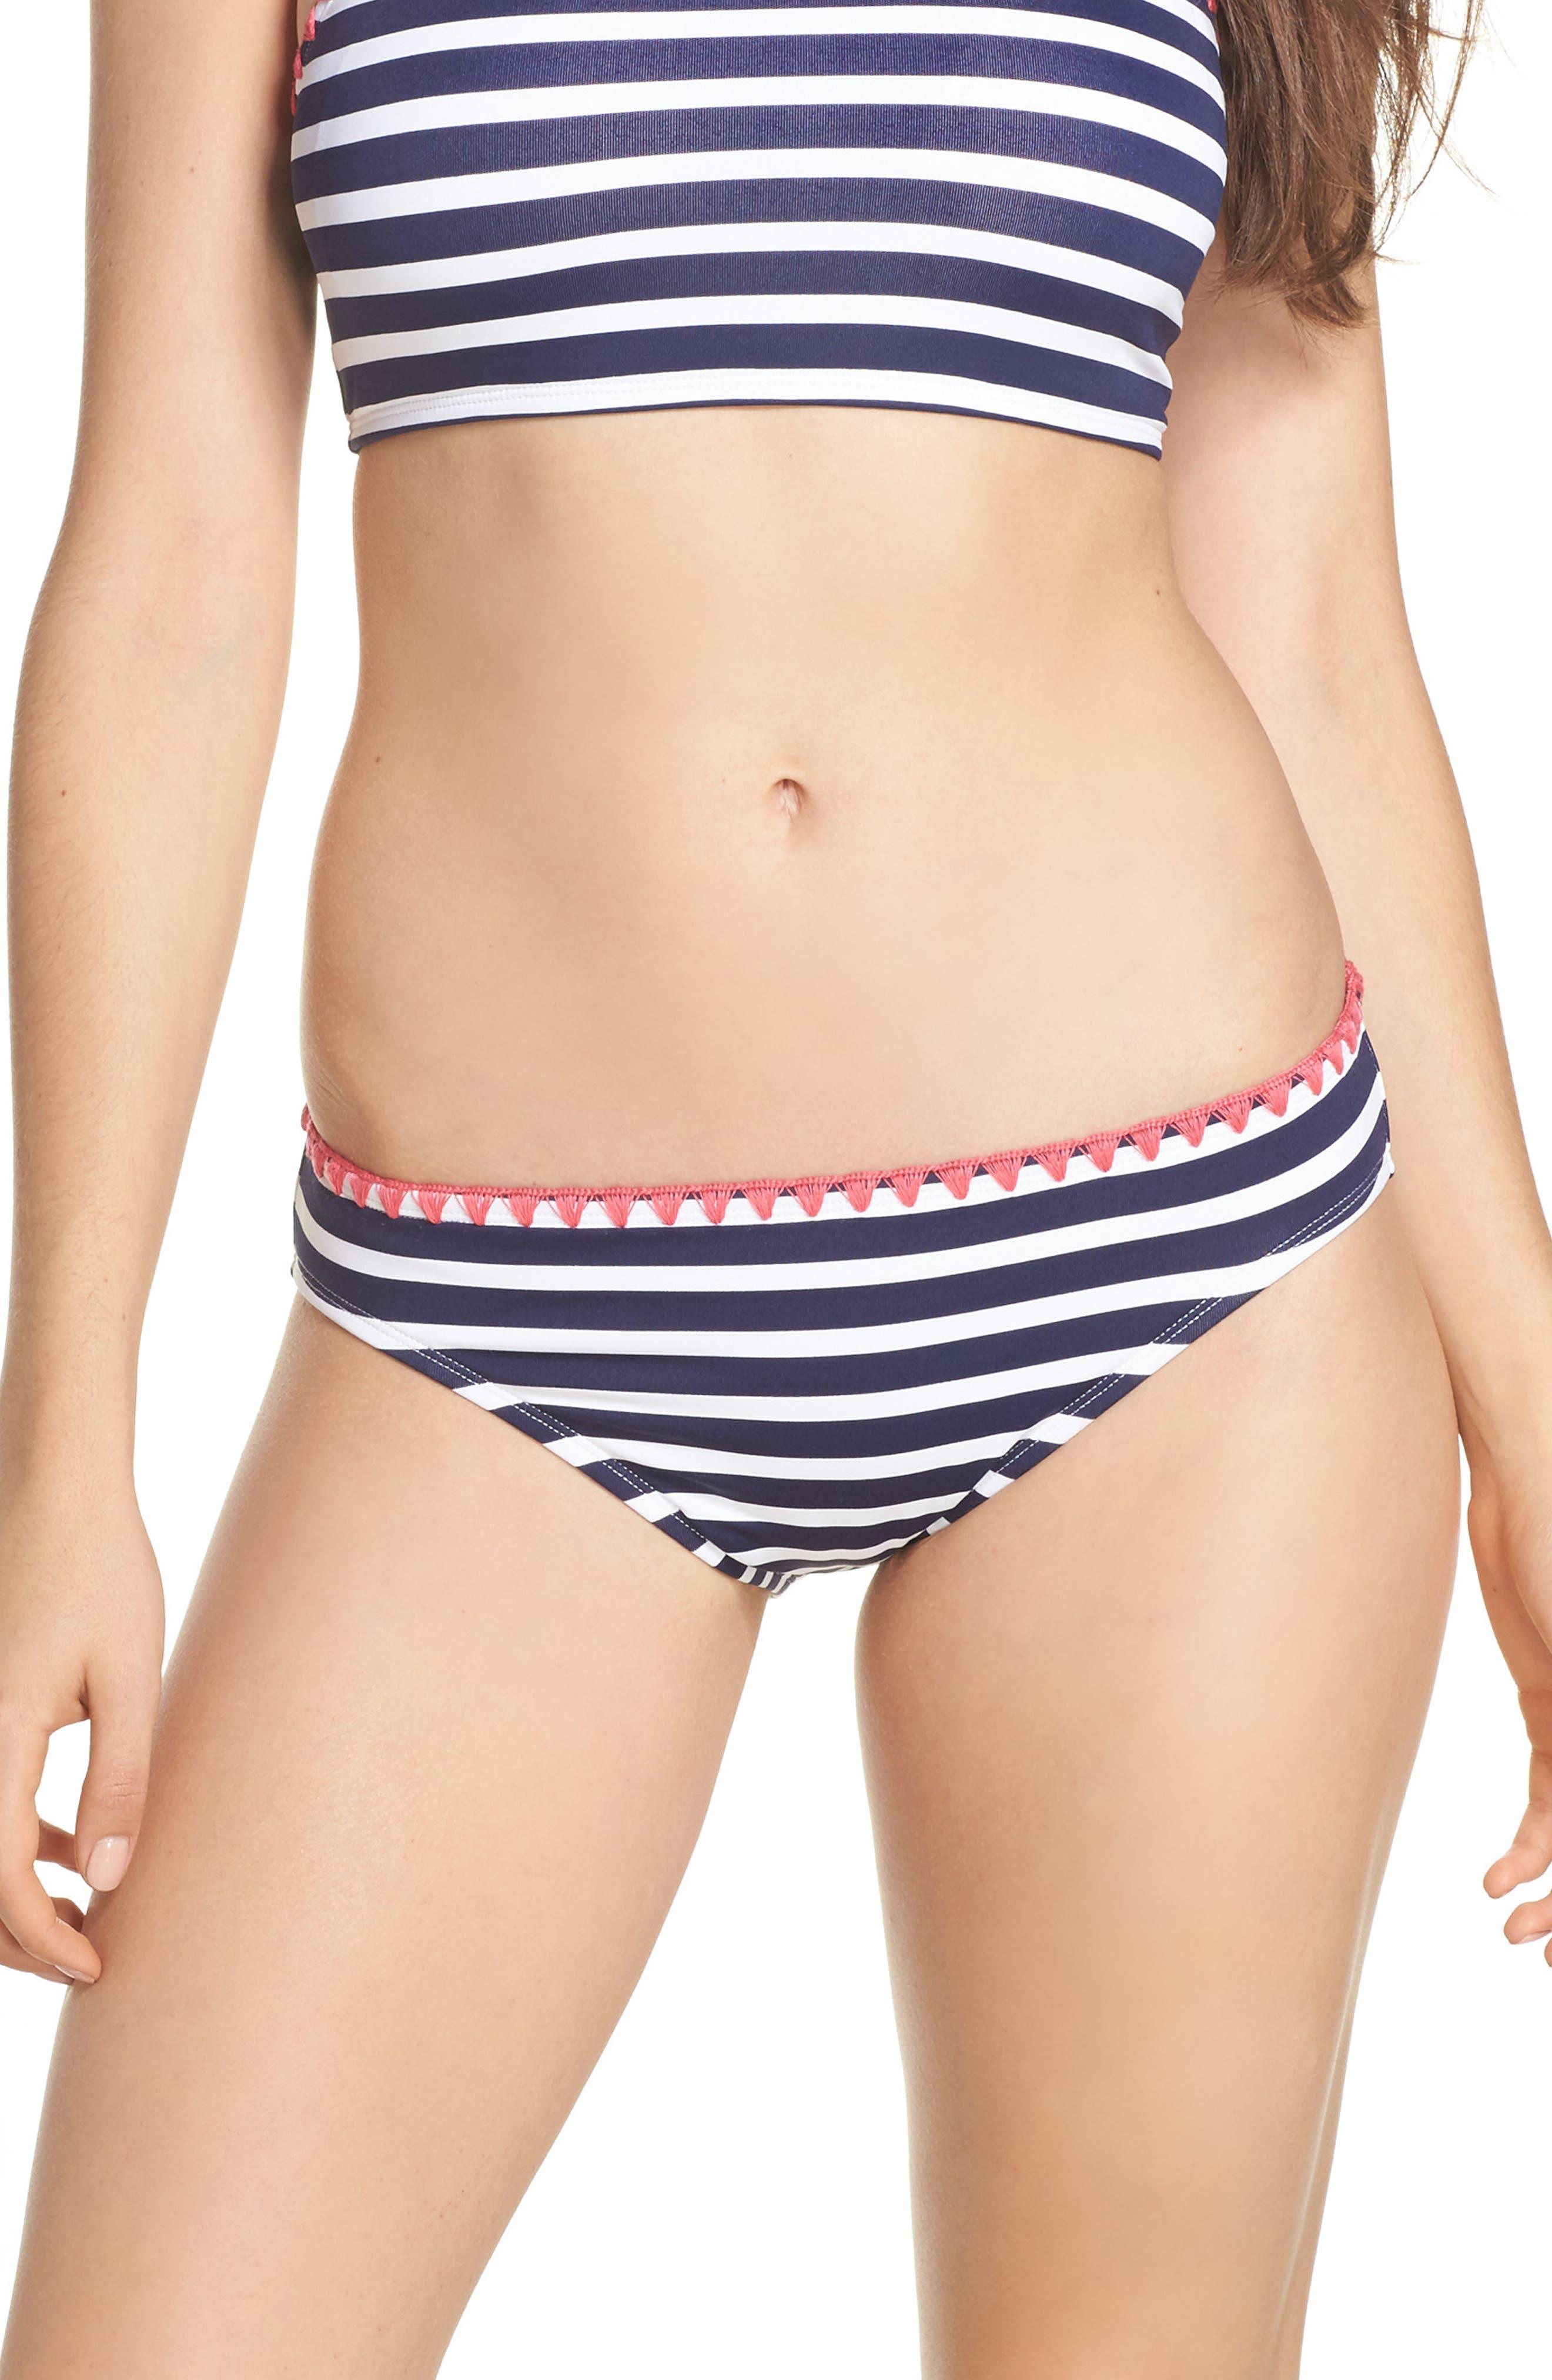 Breton Stripe Bikini Bottoms,                         Main,                         color, Mare Navy/ White